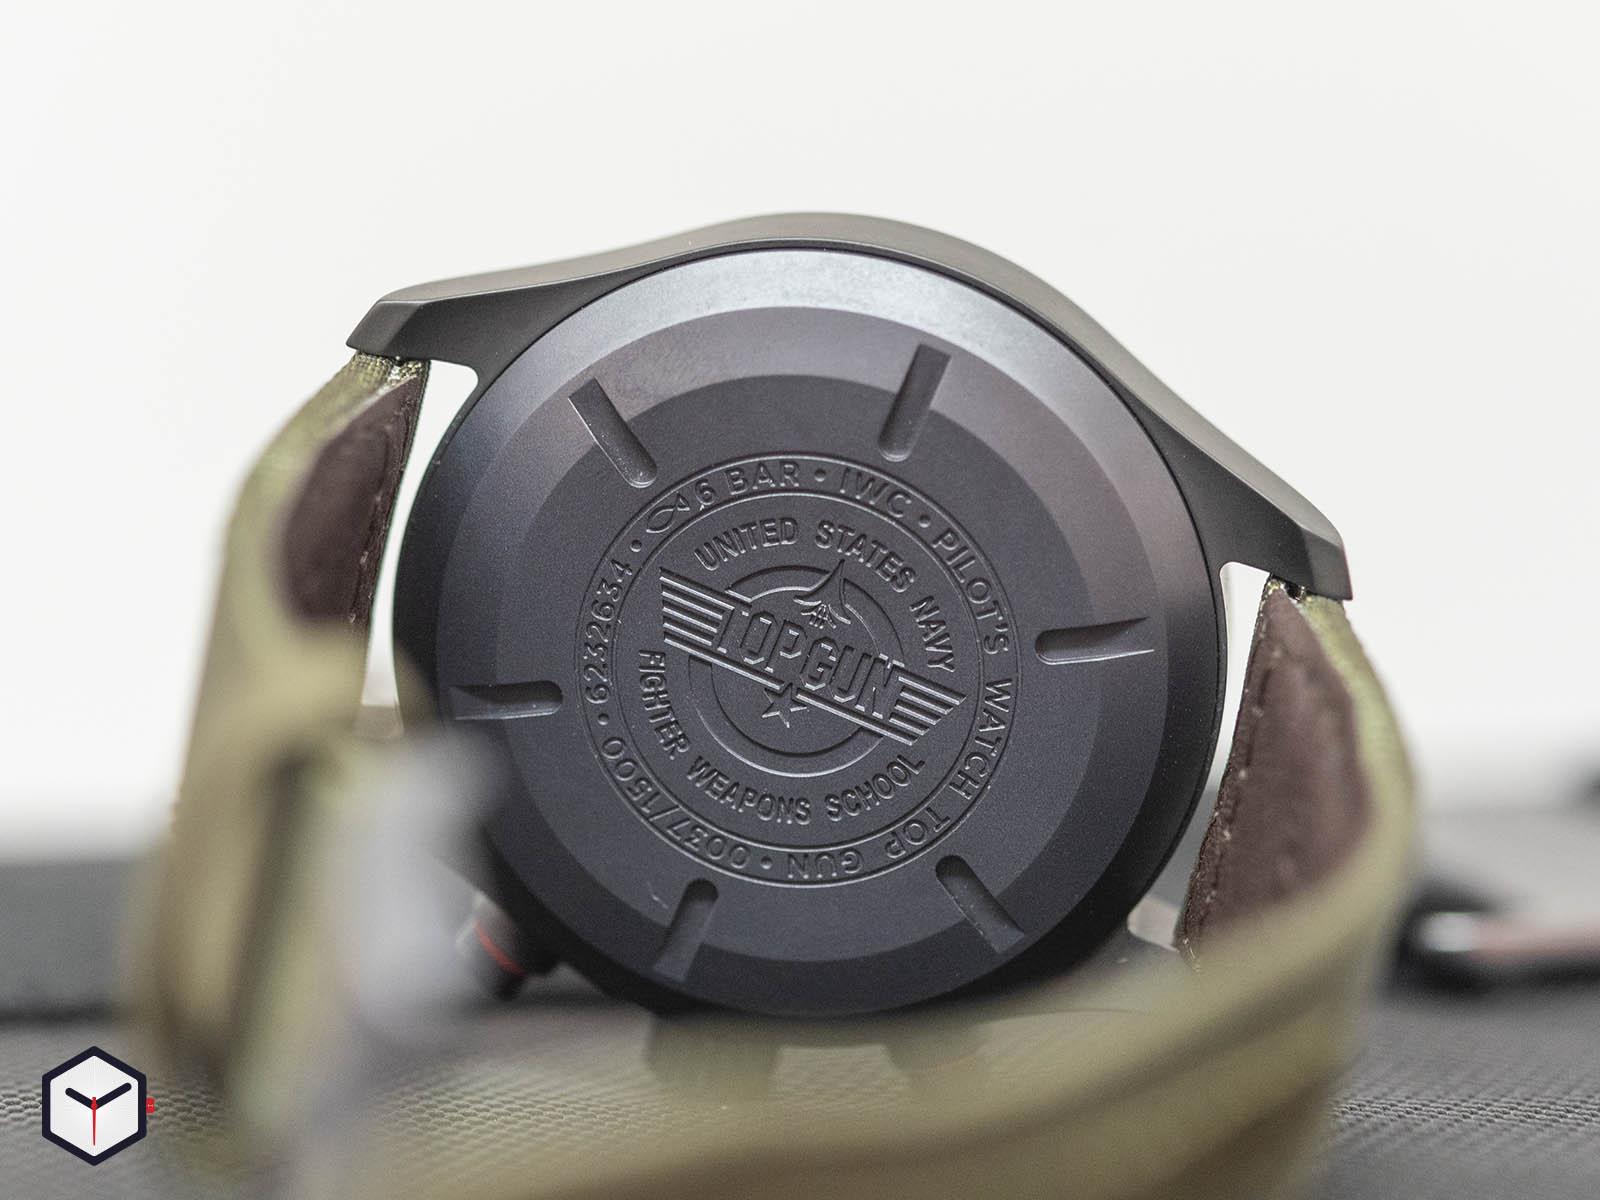 iw389104-iwc-top-gun-sfti-edition-4.jpg